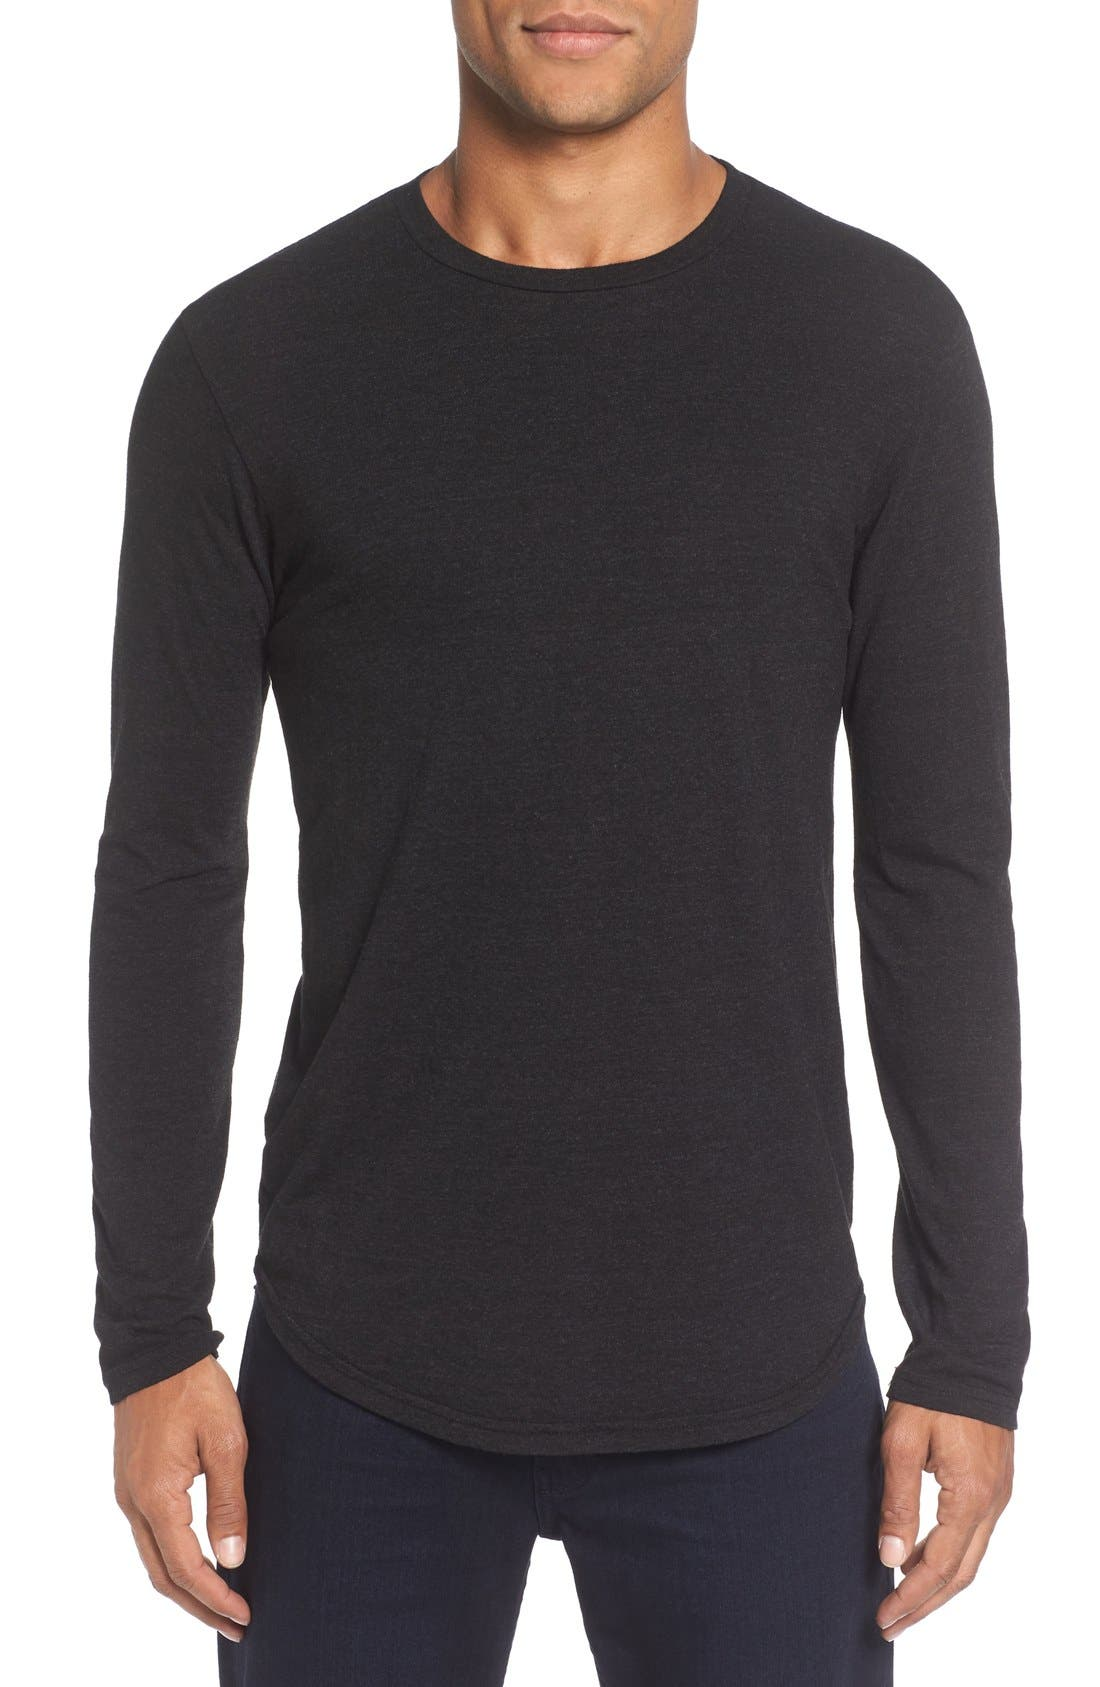 Triblend Scallop Long Sleeve Crewneck T-Shirt, Main, color, 001